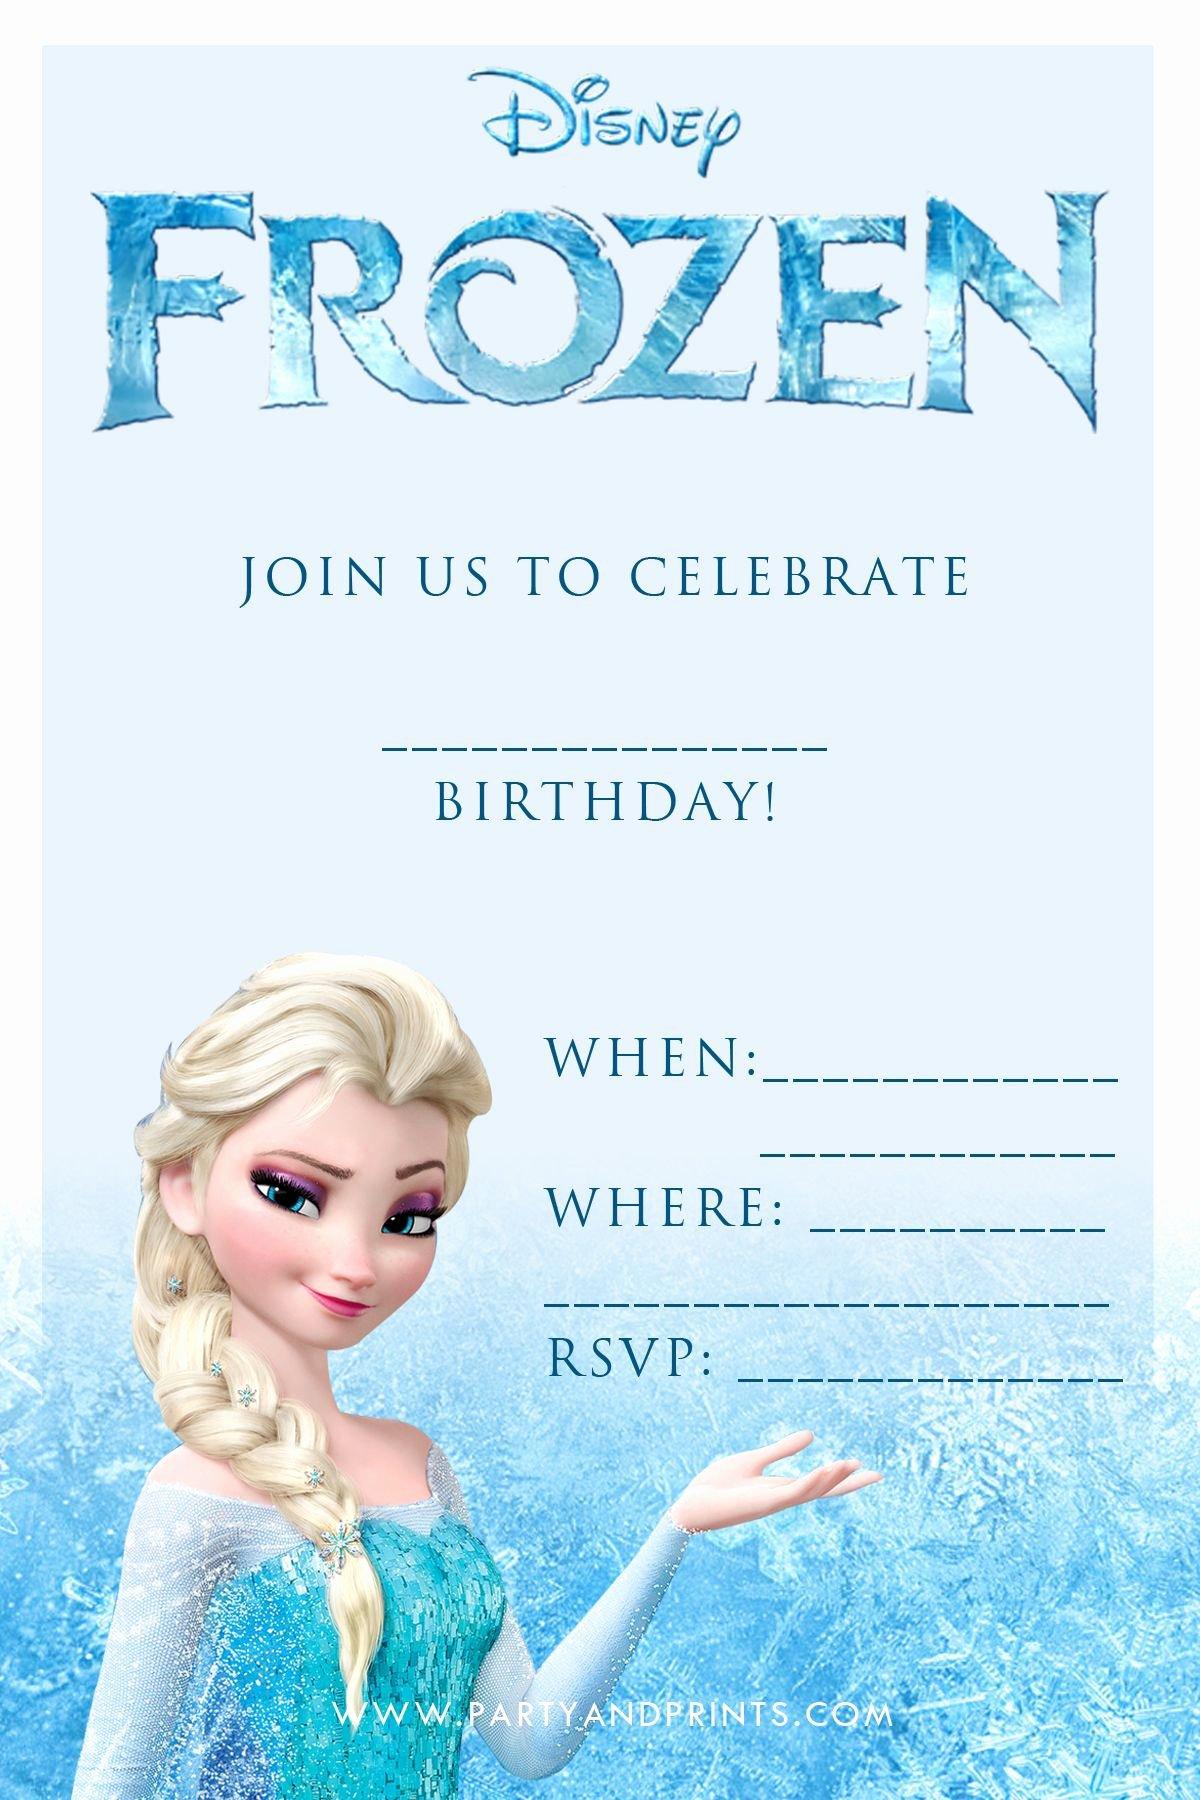 Frozen Birthday Invites Template Inspirational Free Frozen Invitation Birthday Ideas